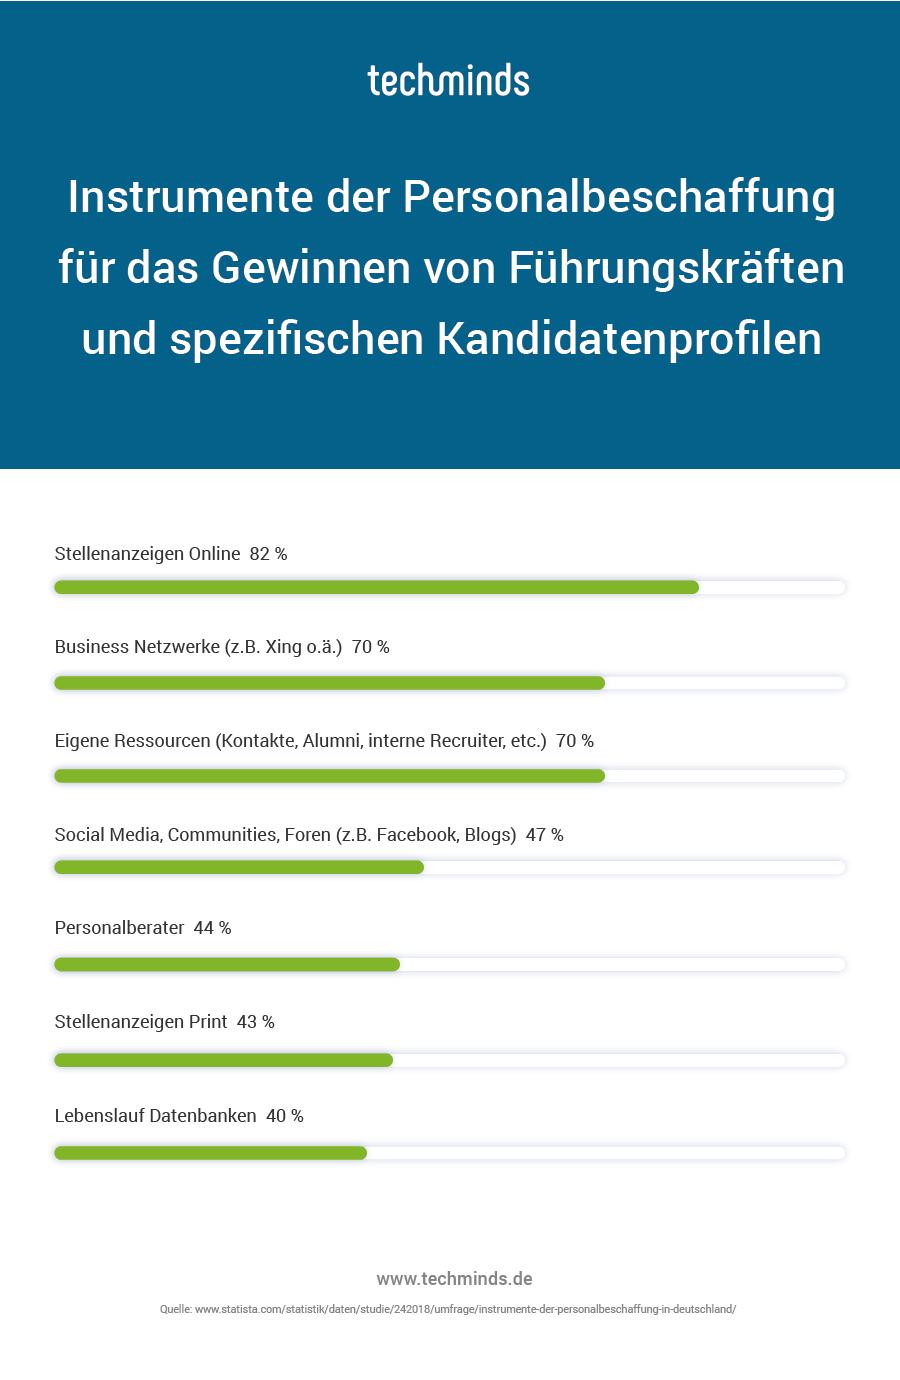 Möglichkeiten der Personalbeschaffung (Quelle: techminds.de)